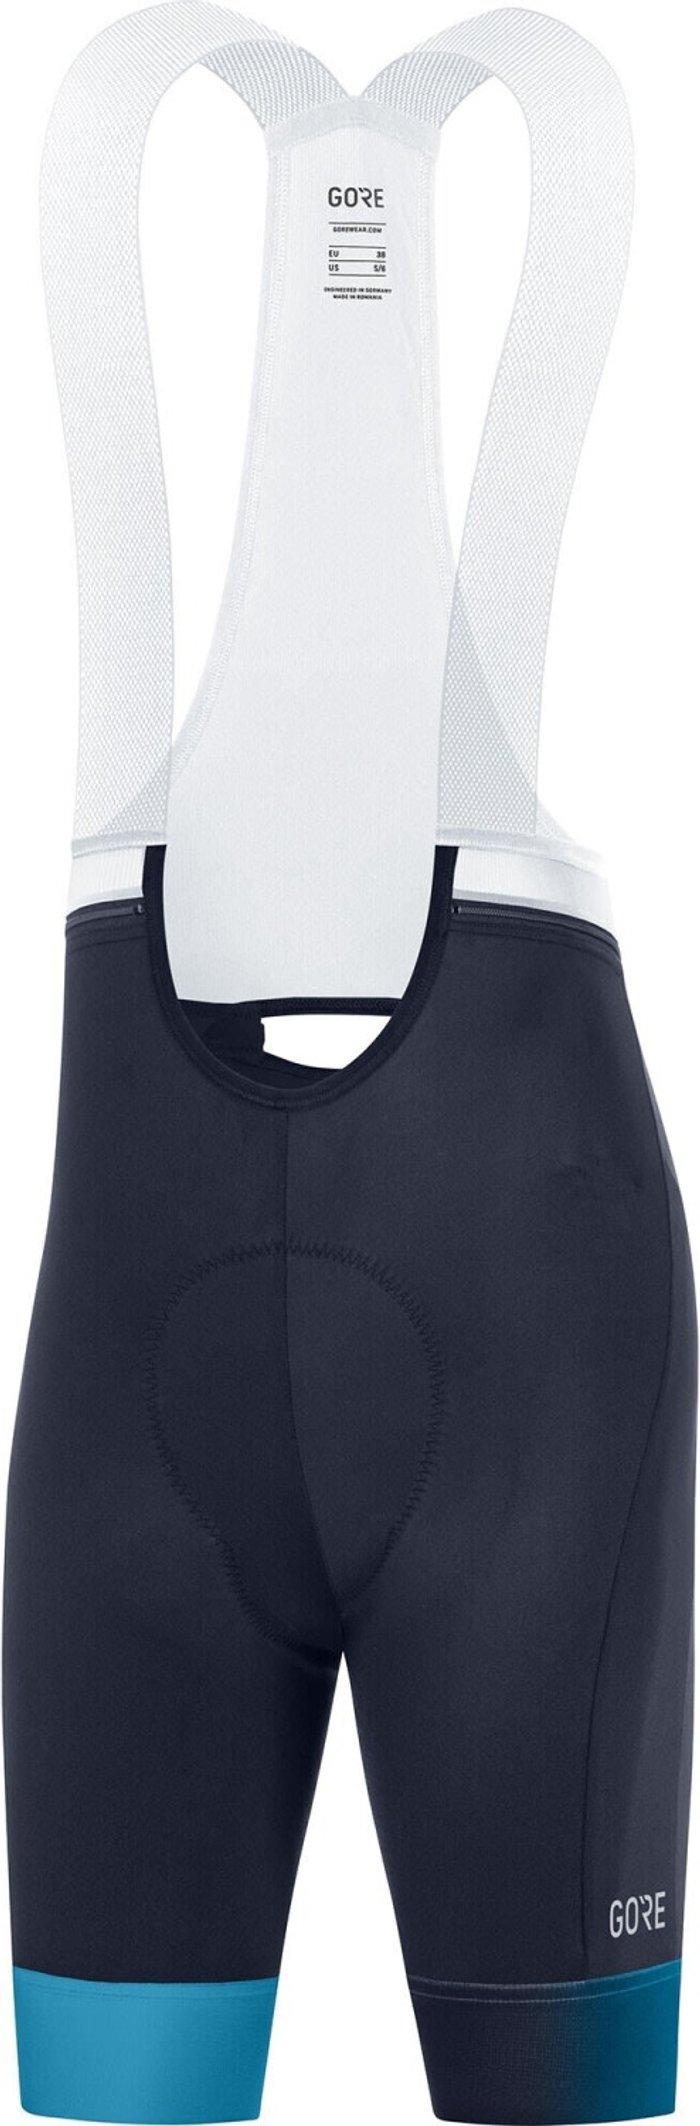 GORE Gore Ardent Bib Shorts+ Women orbit blue